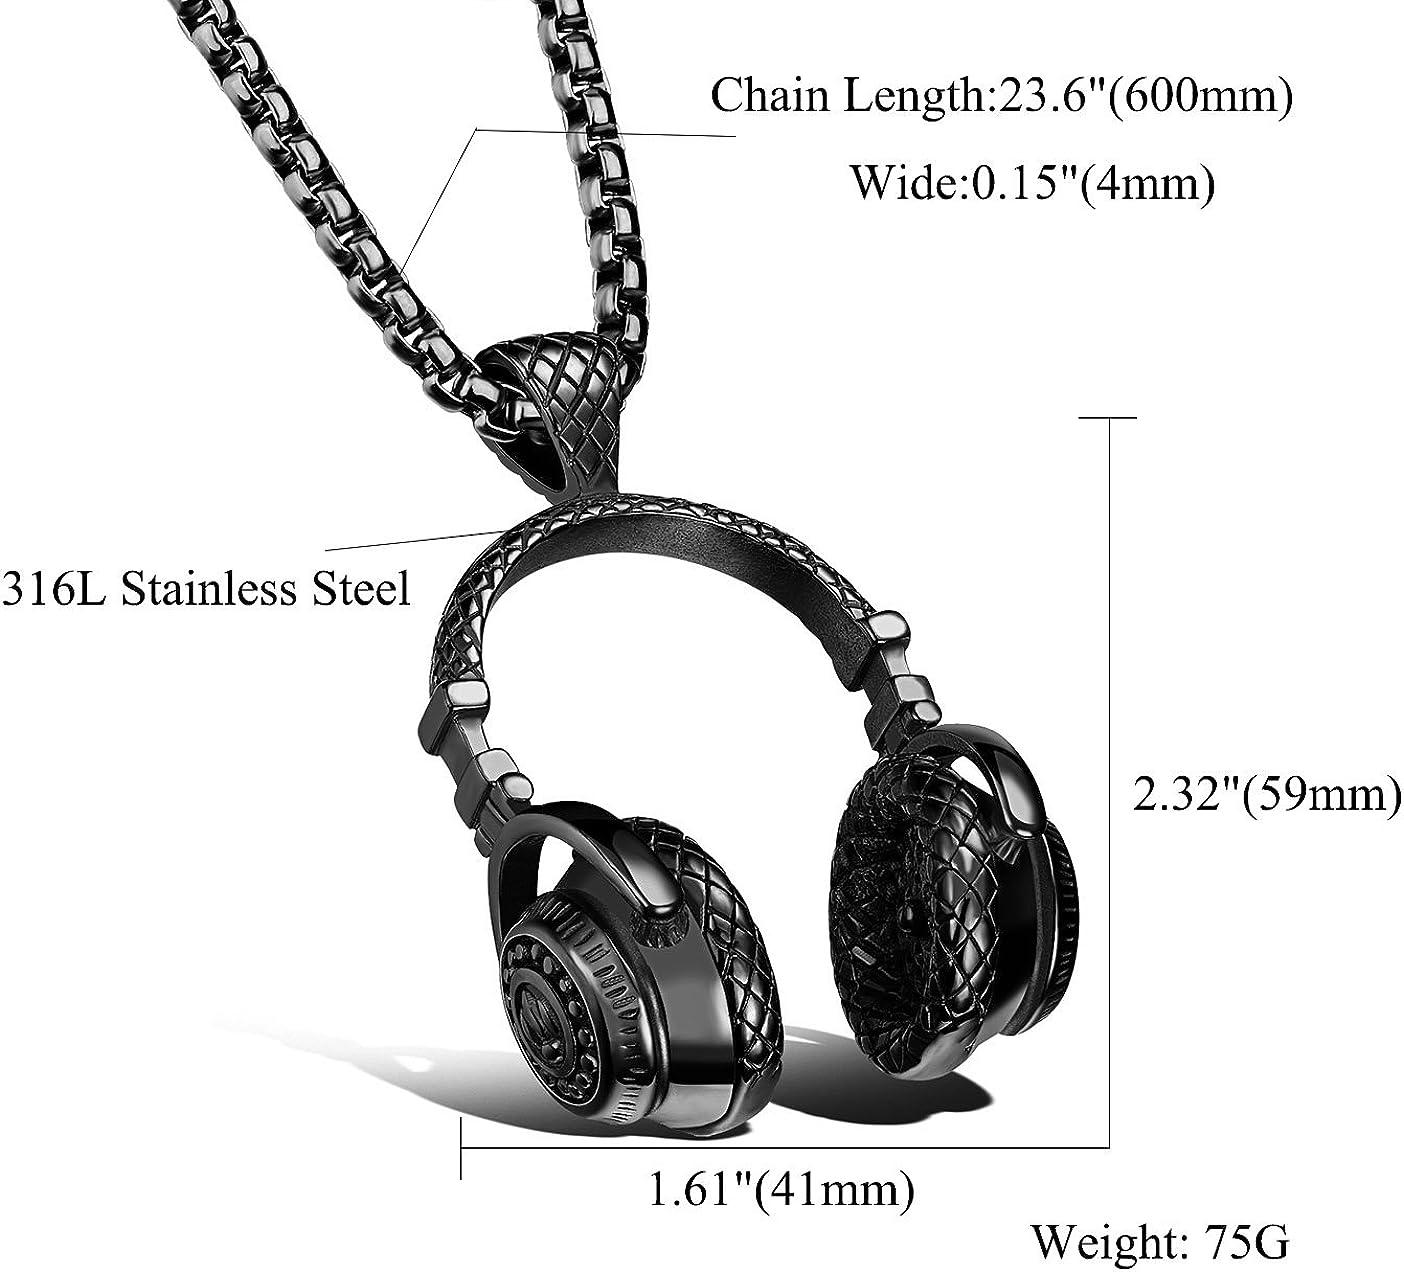 Head Phones Jewelry Headphones Necklace Silver Headset Music Gift for Sound Tech Best Friend BFF Hip Hop Rapper Rap Teenage Boy teen girl